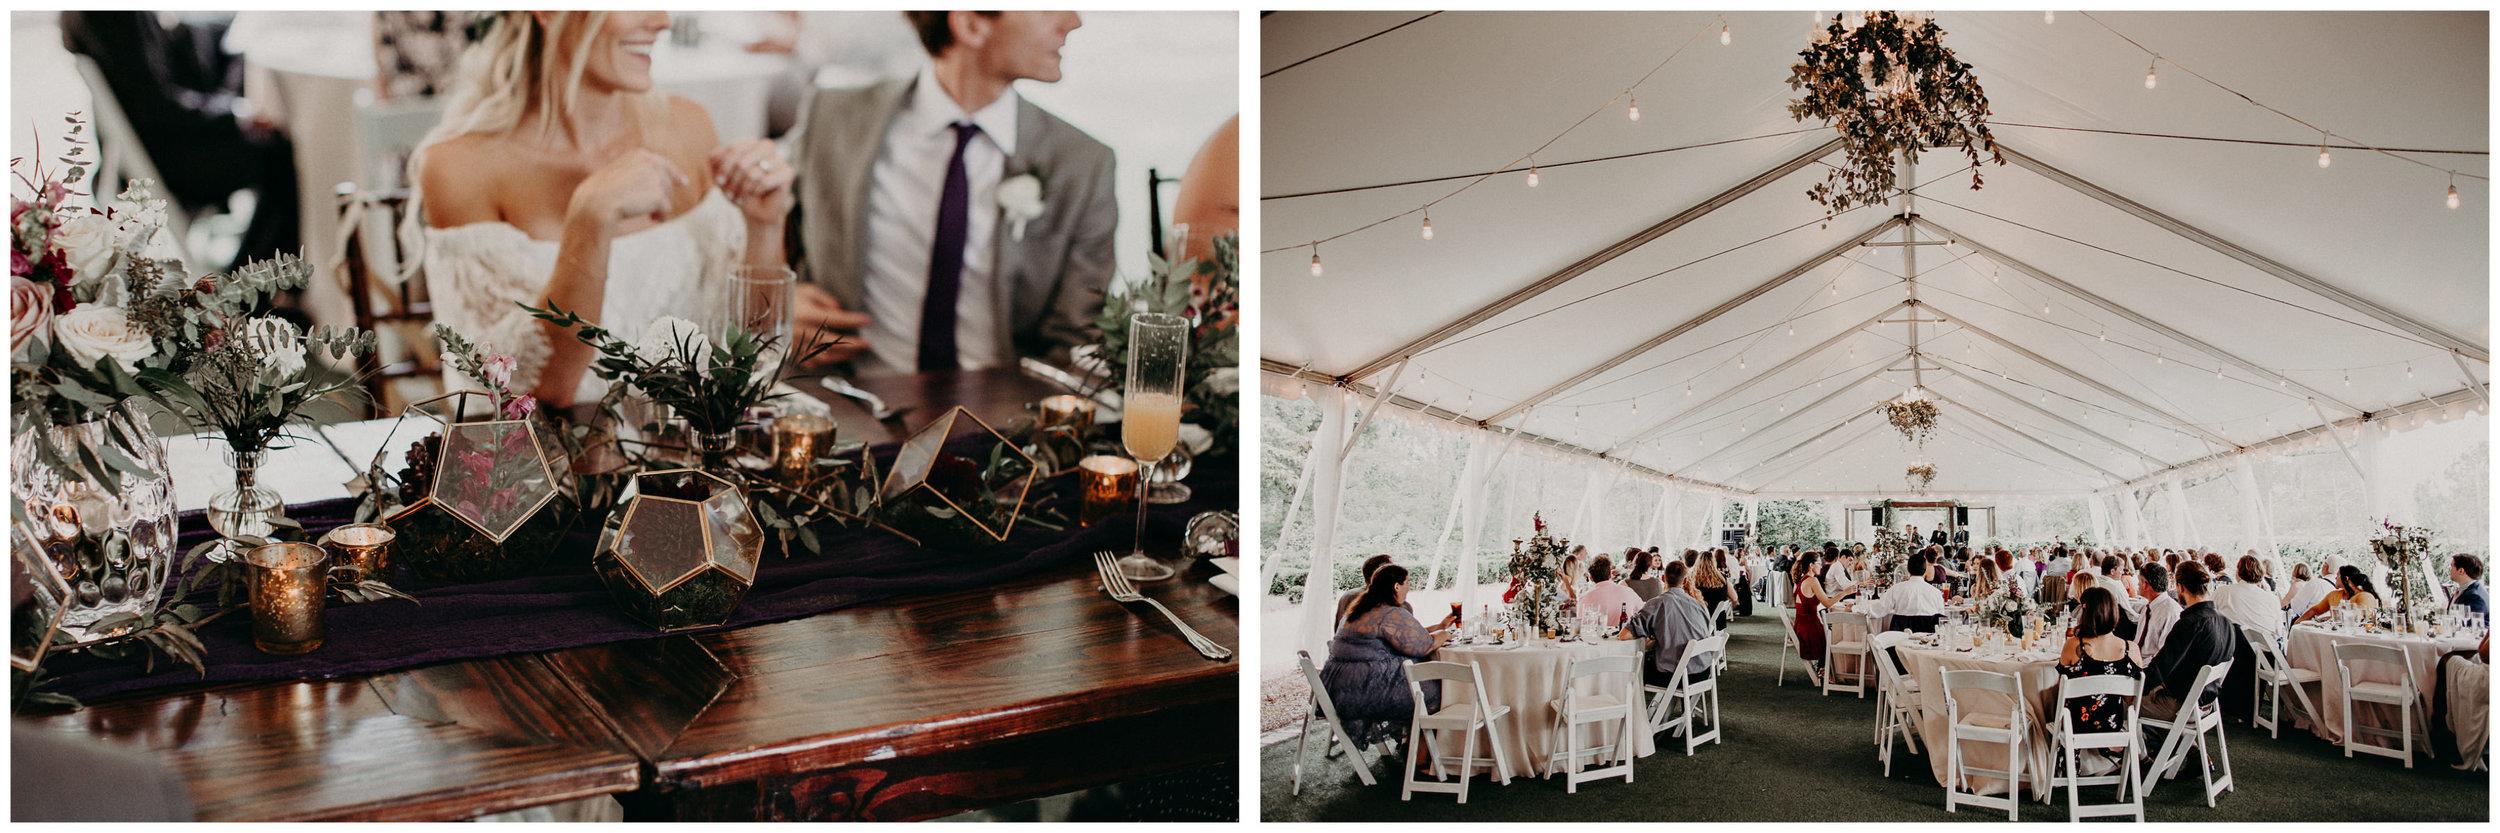 116 - Barnsley Gardens Wedding -Bride and groom portraits - Atlanta wedding photographer .jpg